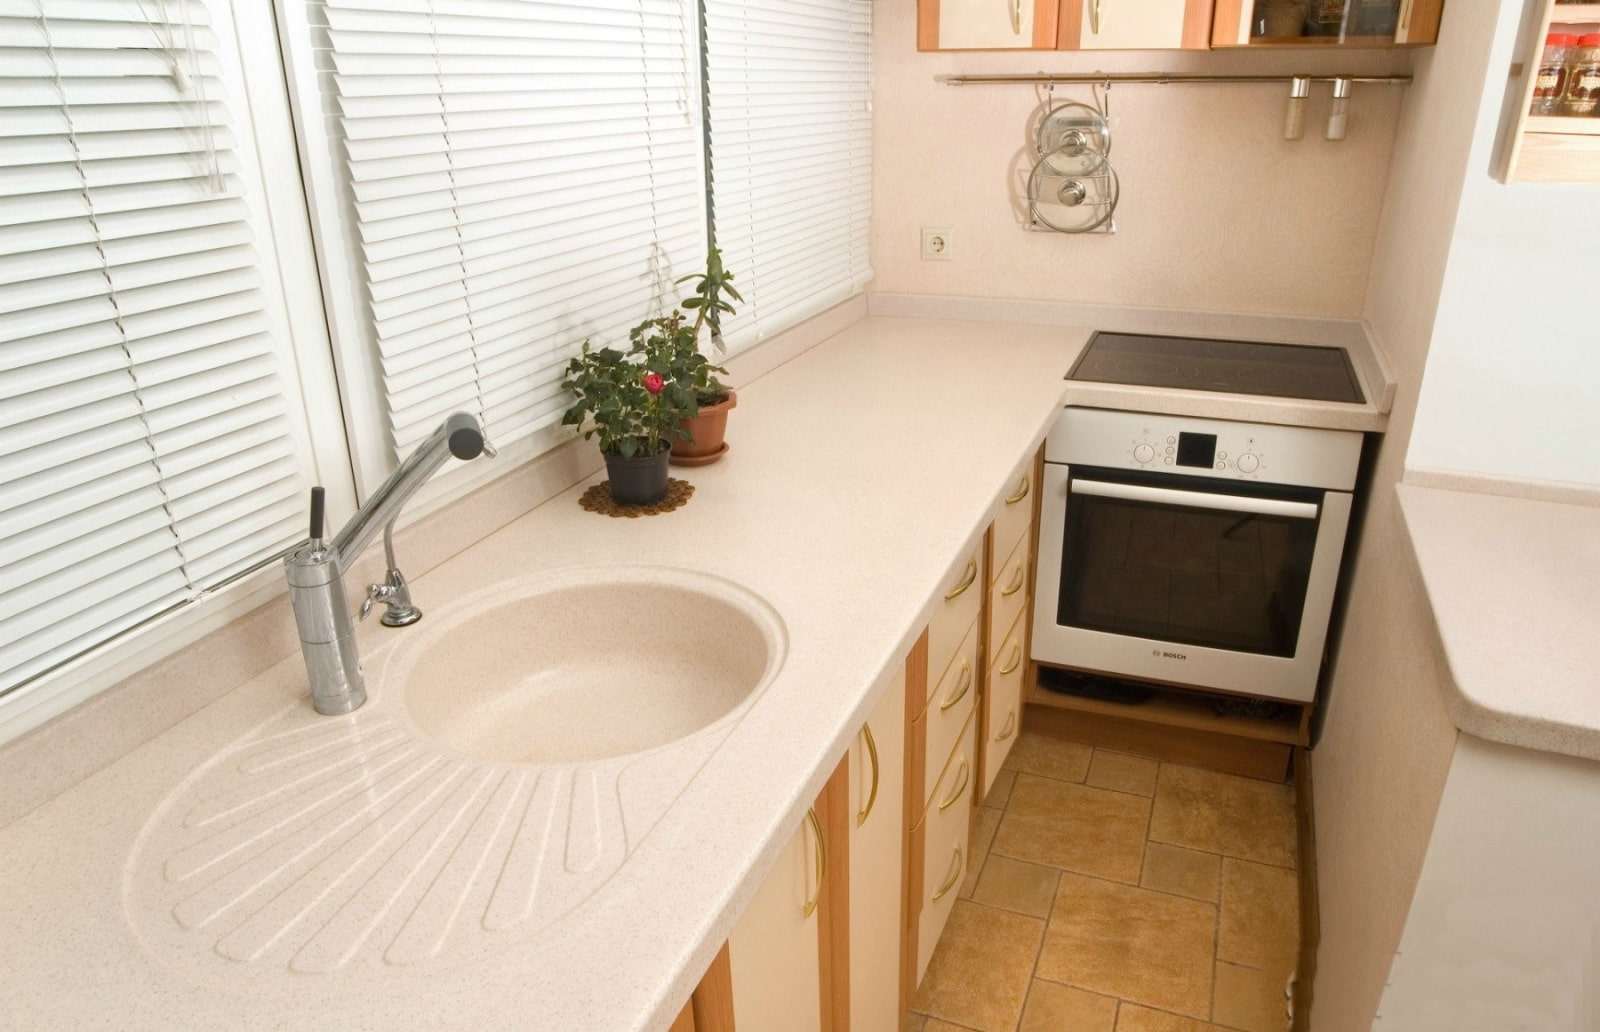 лохан кухня перенесенная на балкон фото трудно белокуром